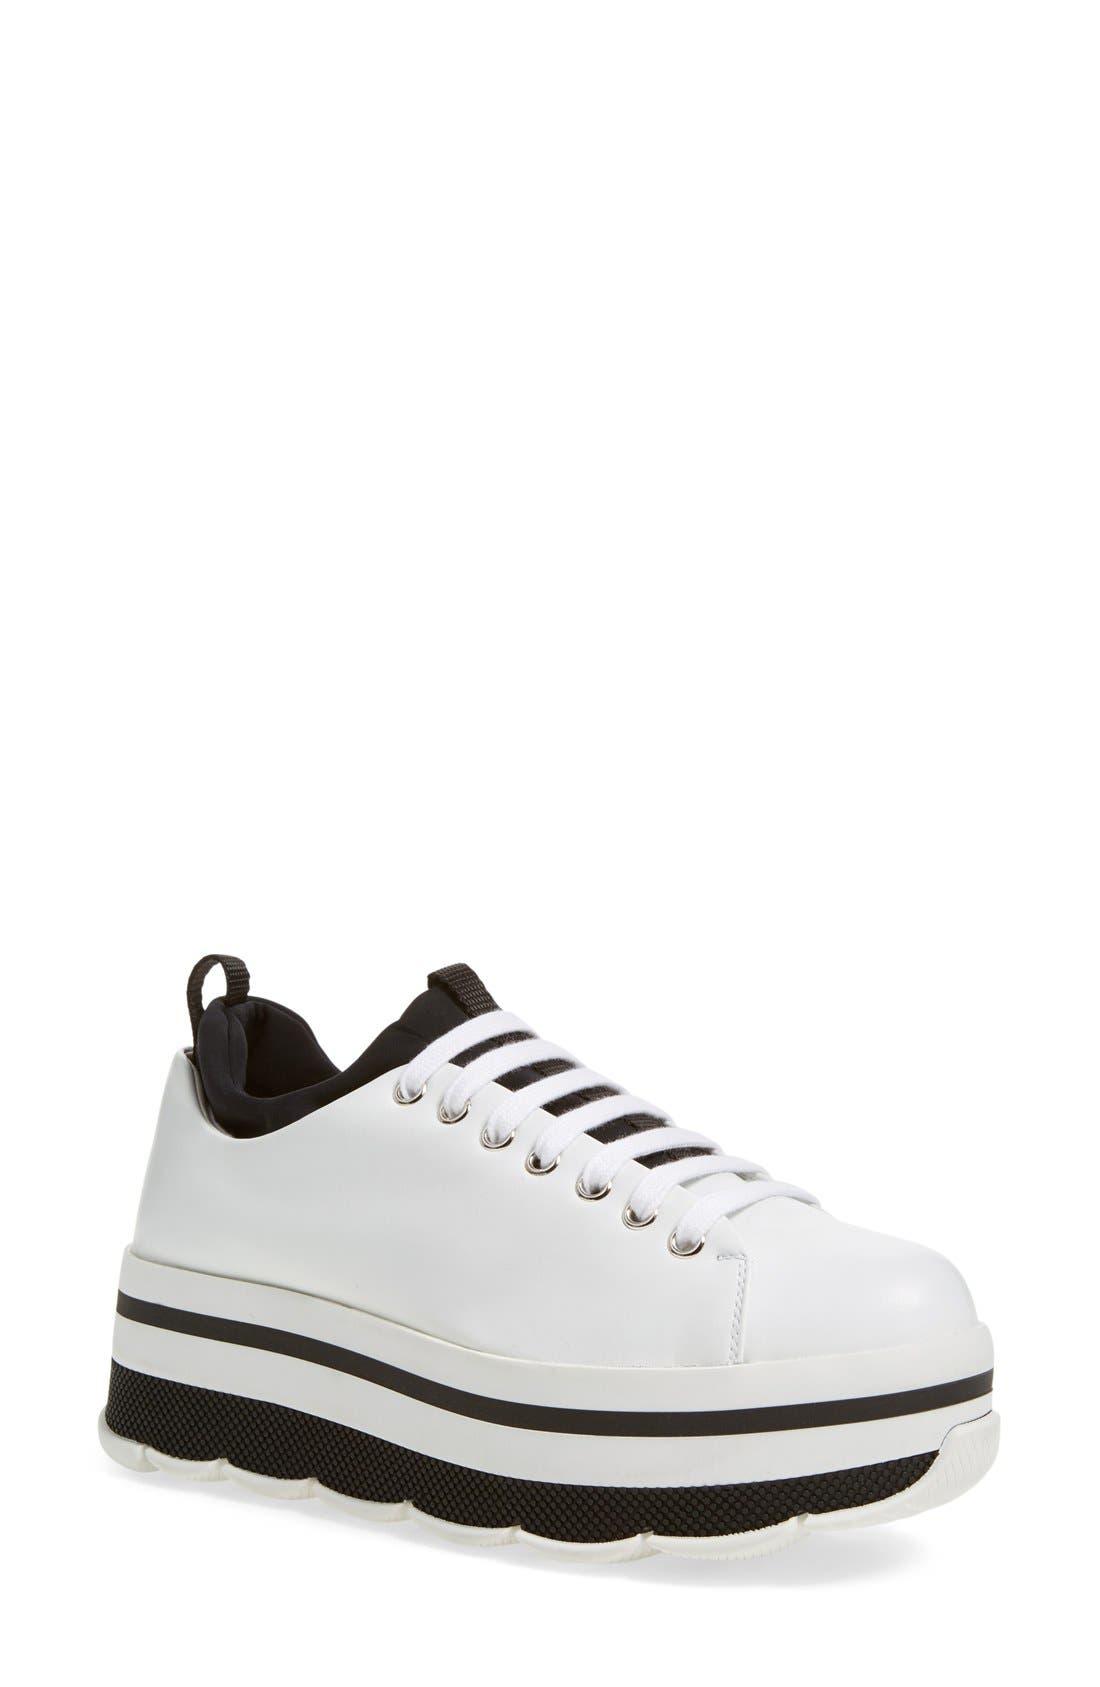 Alternate Image 1 Selected - Prada Linea Rossa Platform Sneaker (Women)